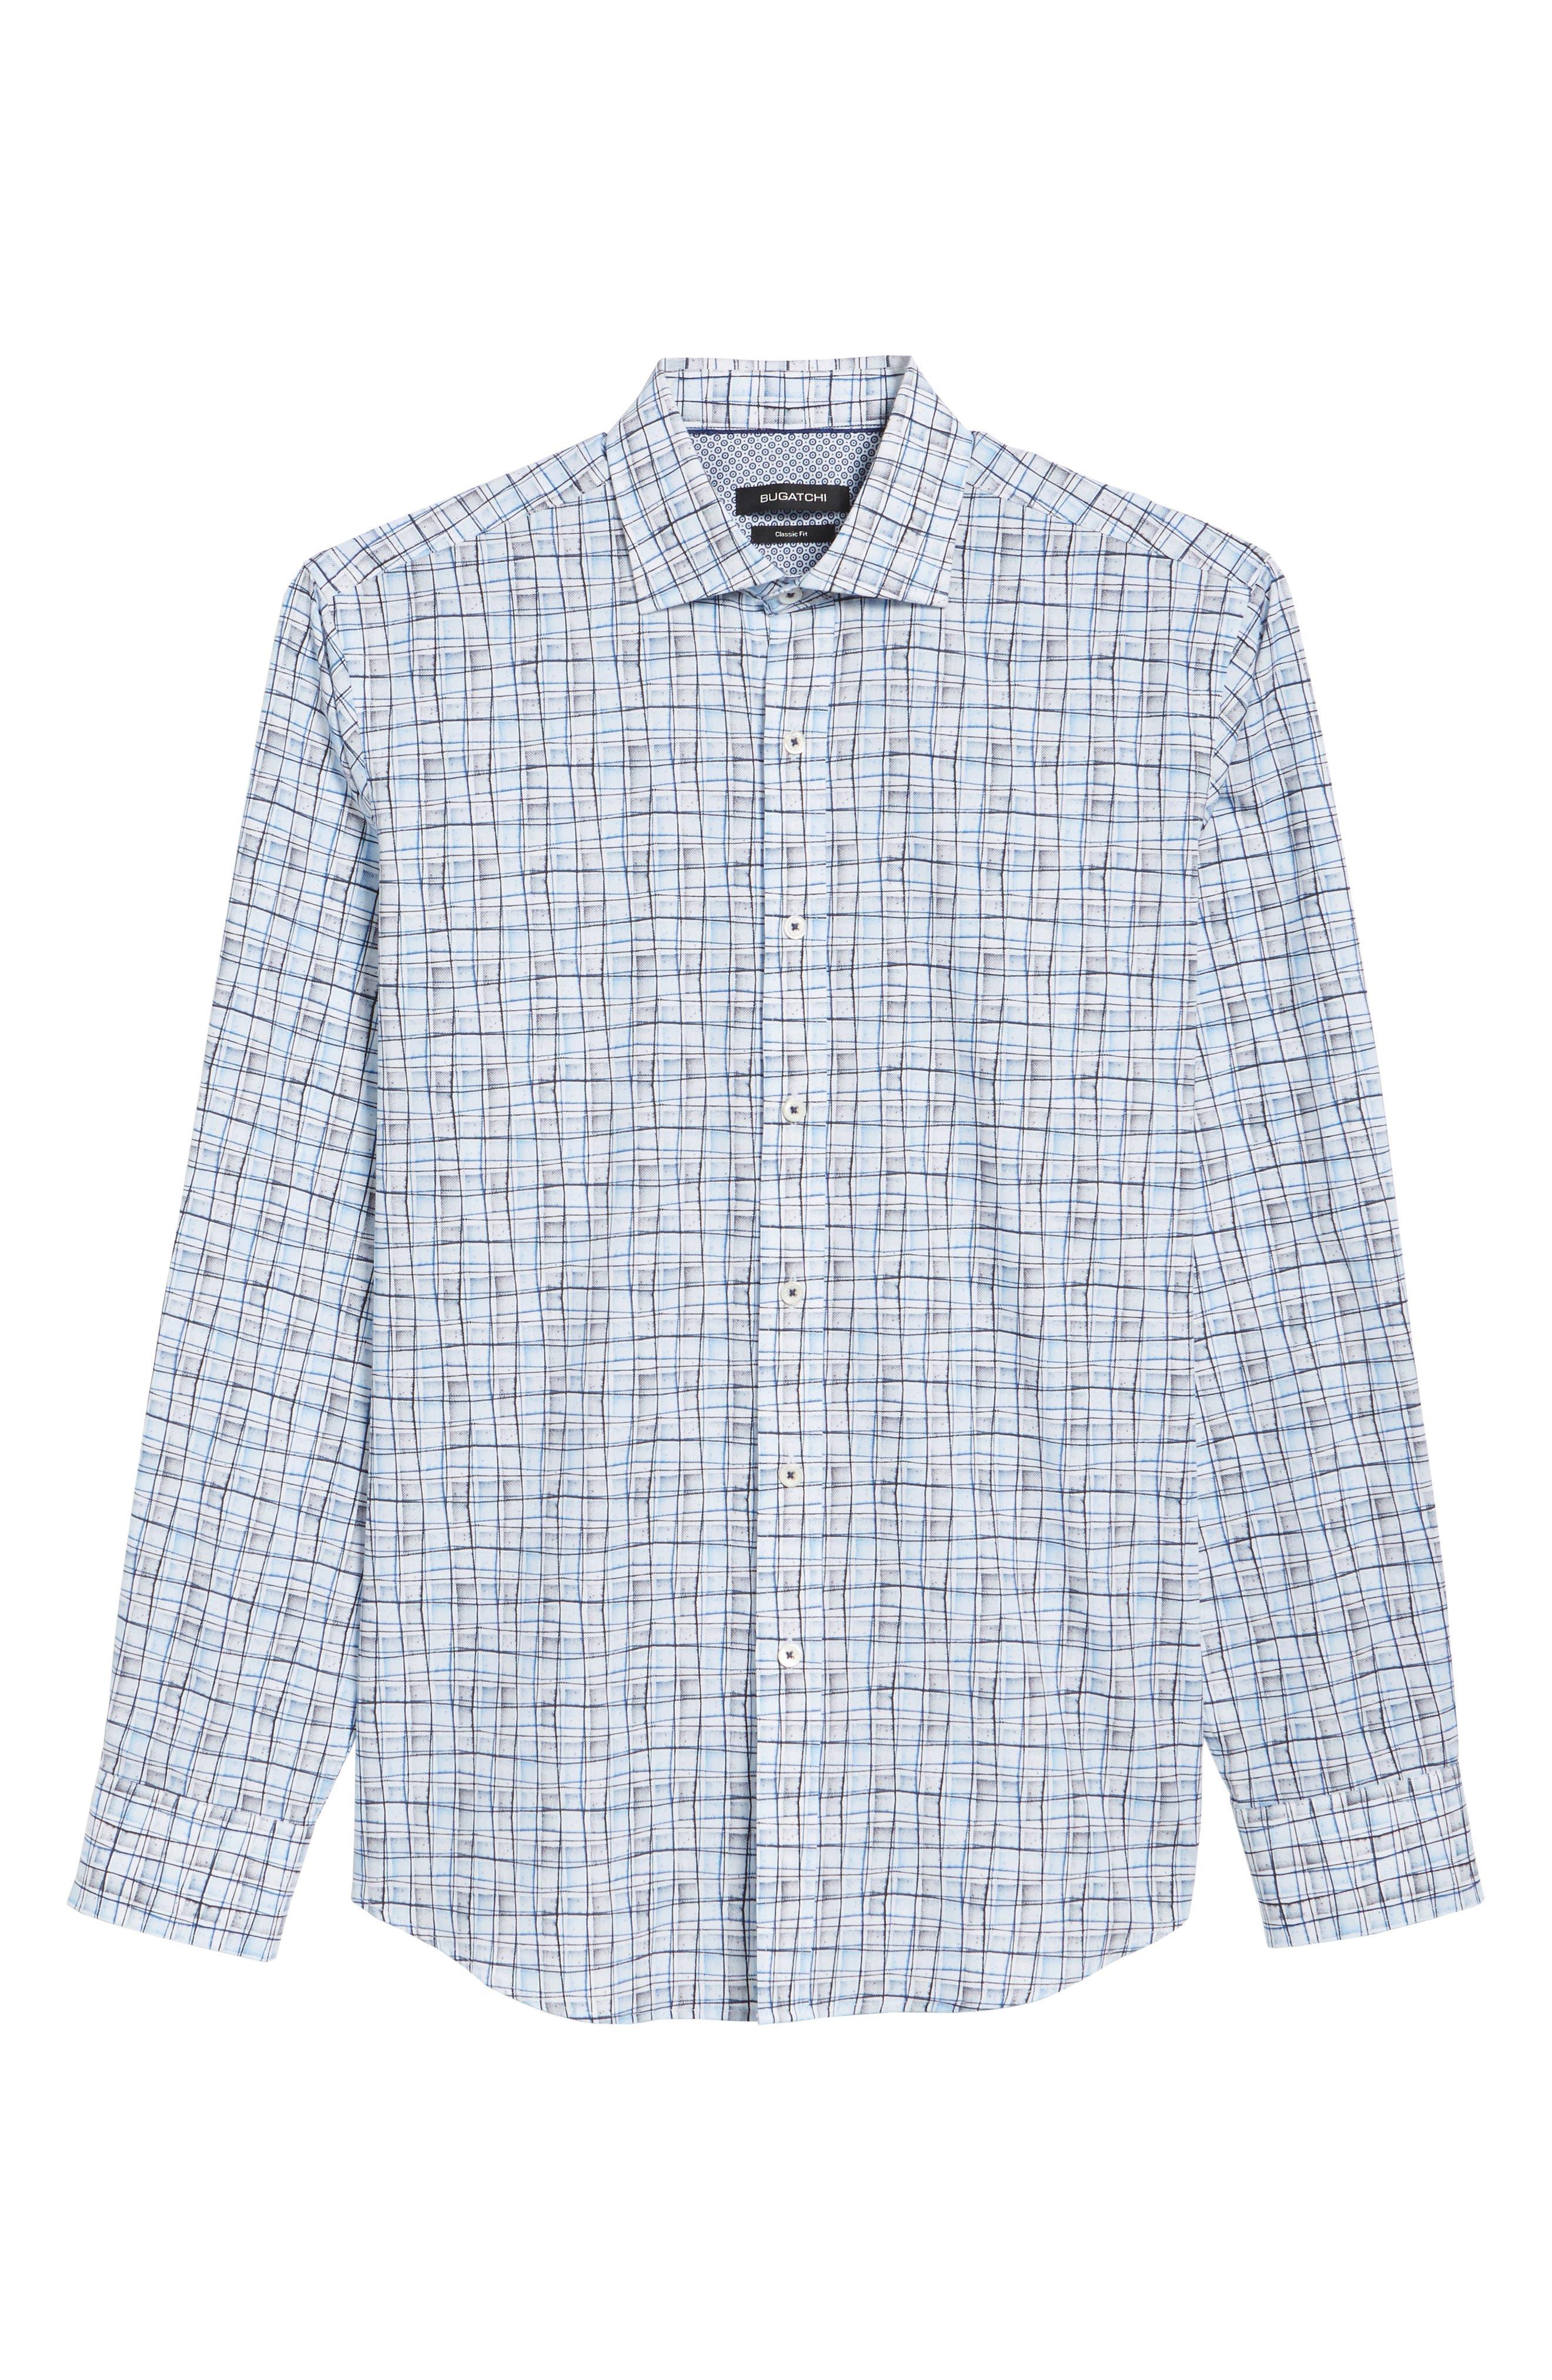 Regular Fit Grid Sport Shirt,                             Alternate thumbnail 6, color,                             Platinum